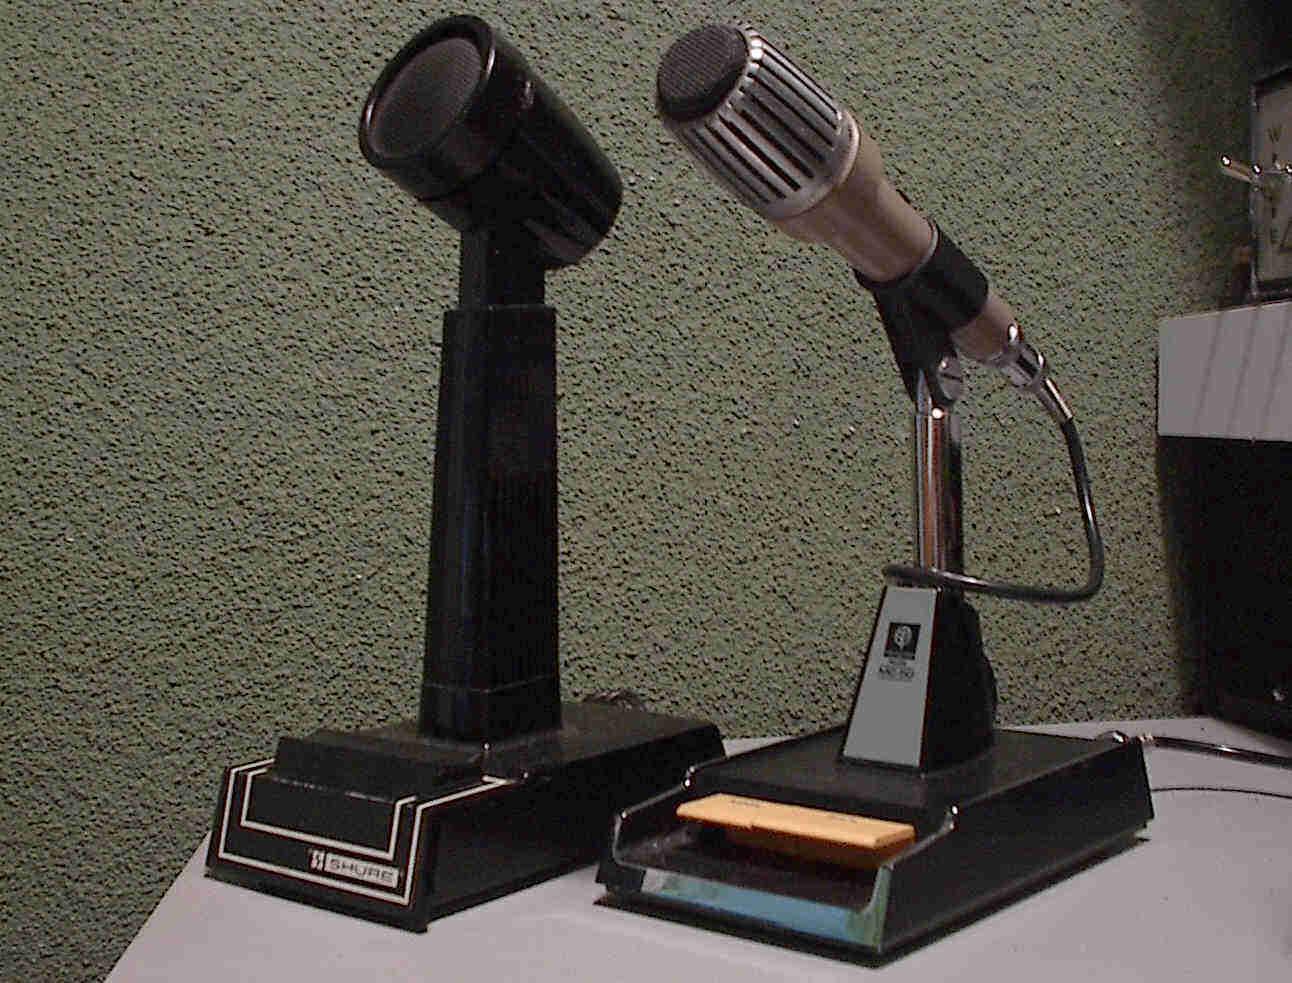 heil microphone wiring diagram nitrous purge shure 444 icm elsavadorla